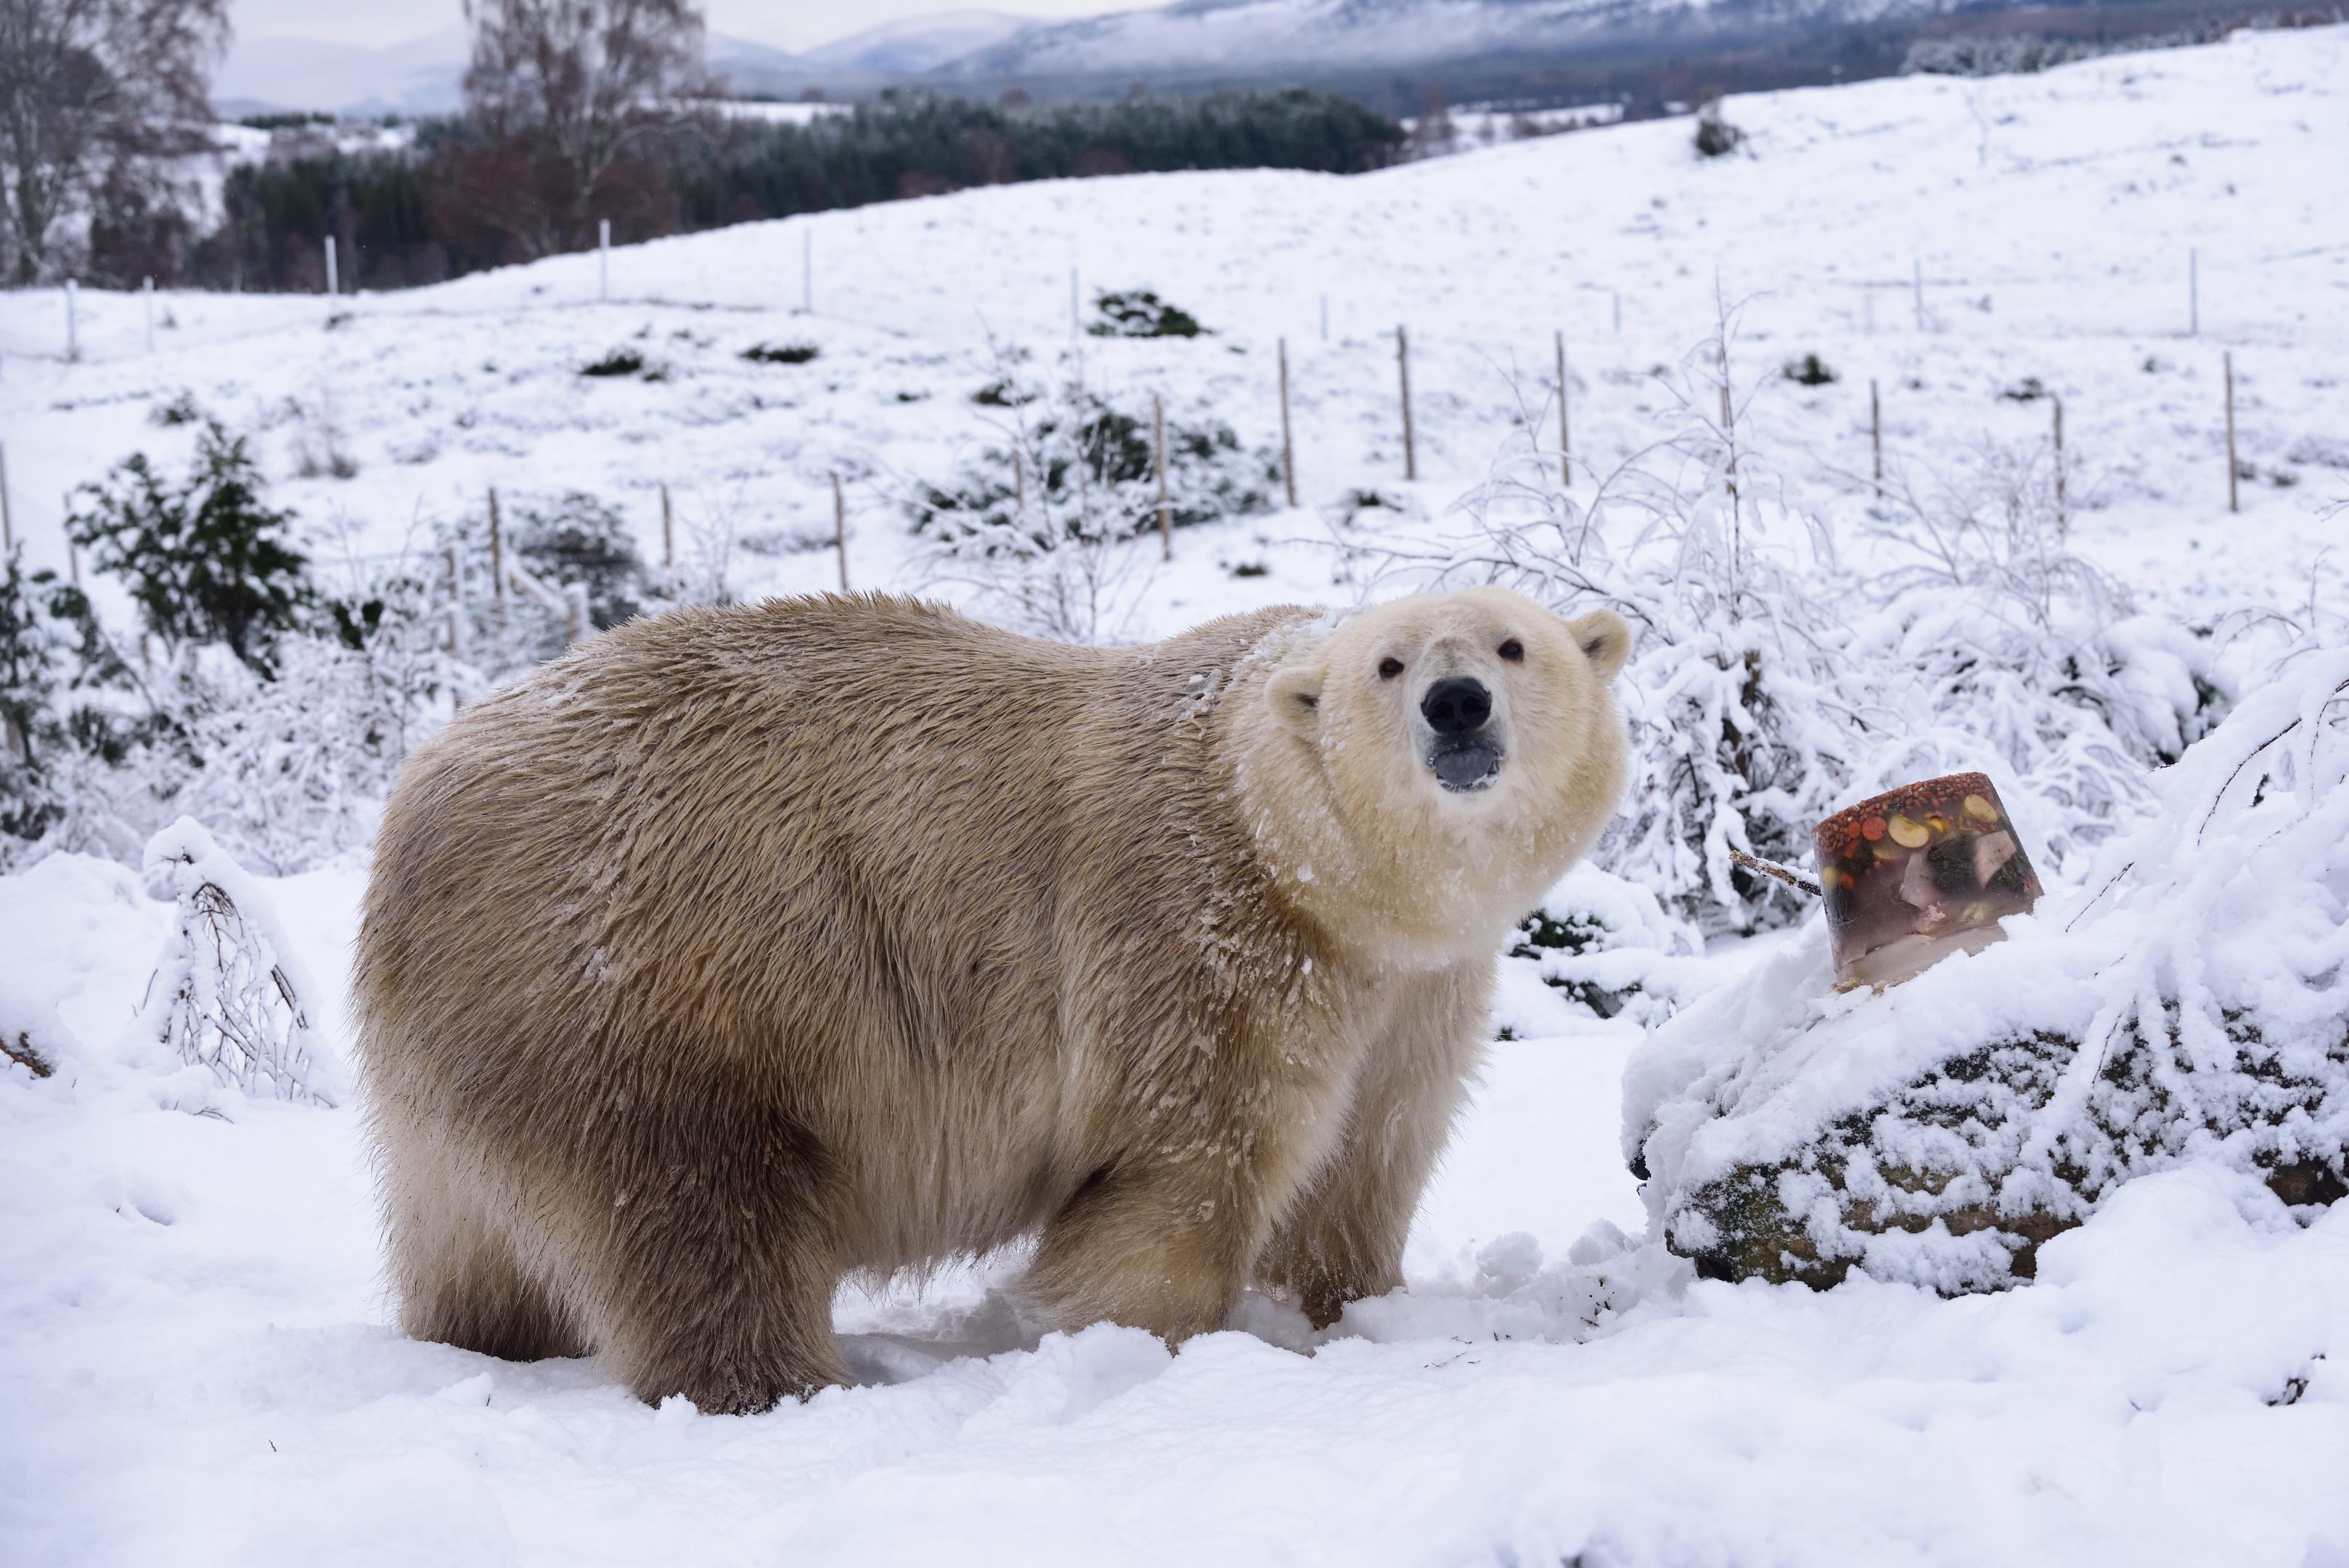 Victoria the Polar Bear (RZSS/Alex Riddell)